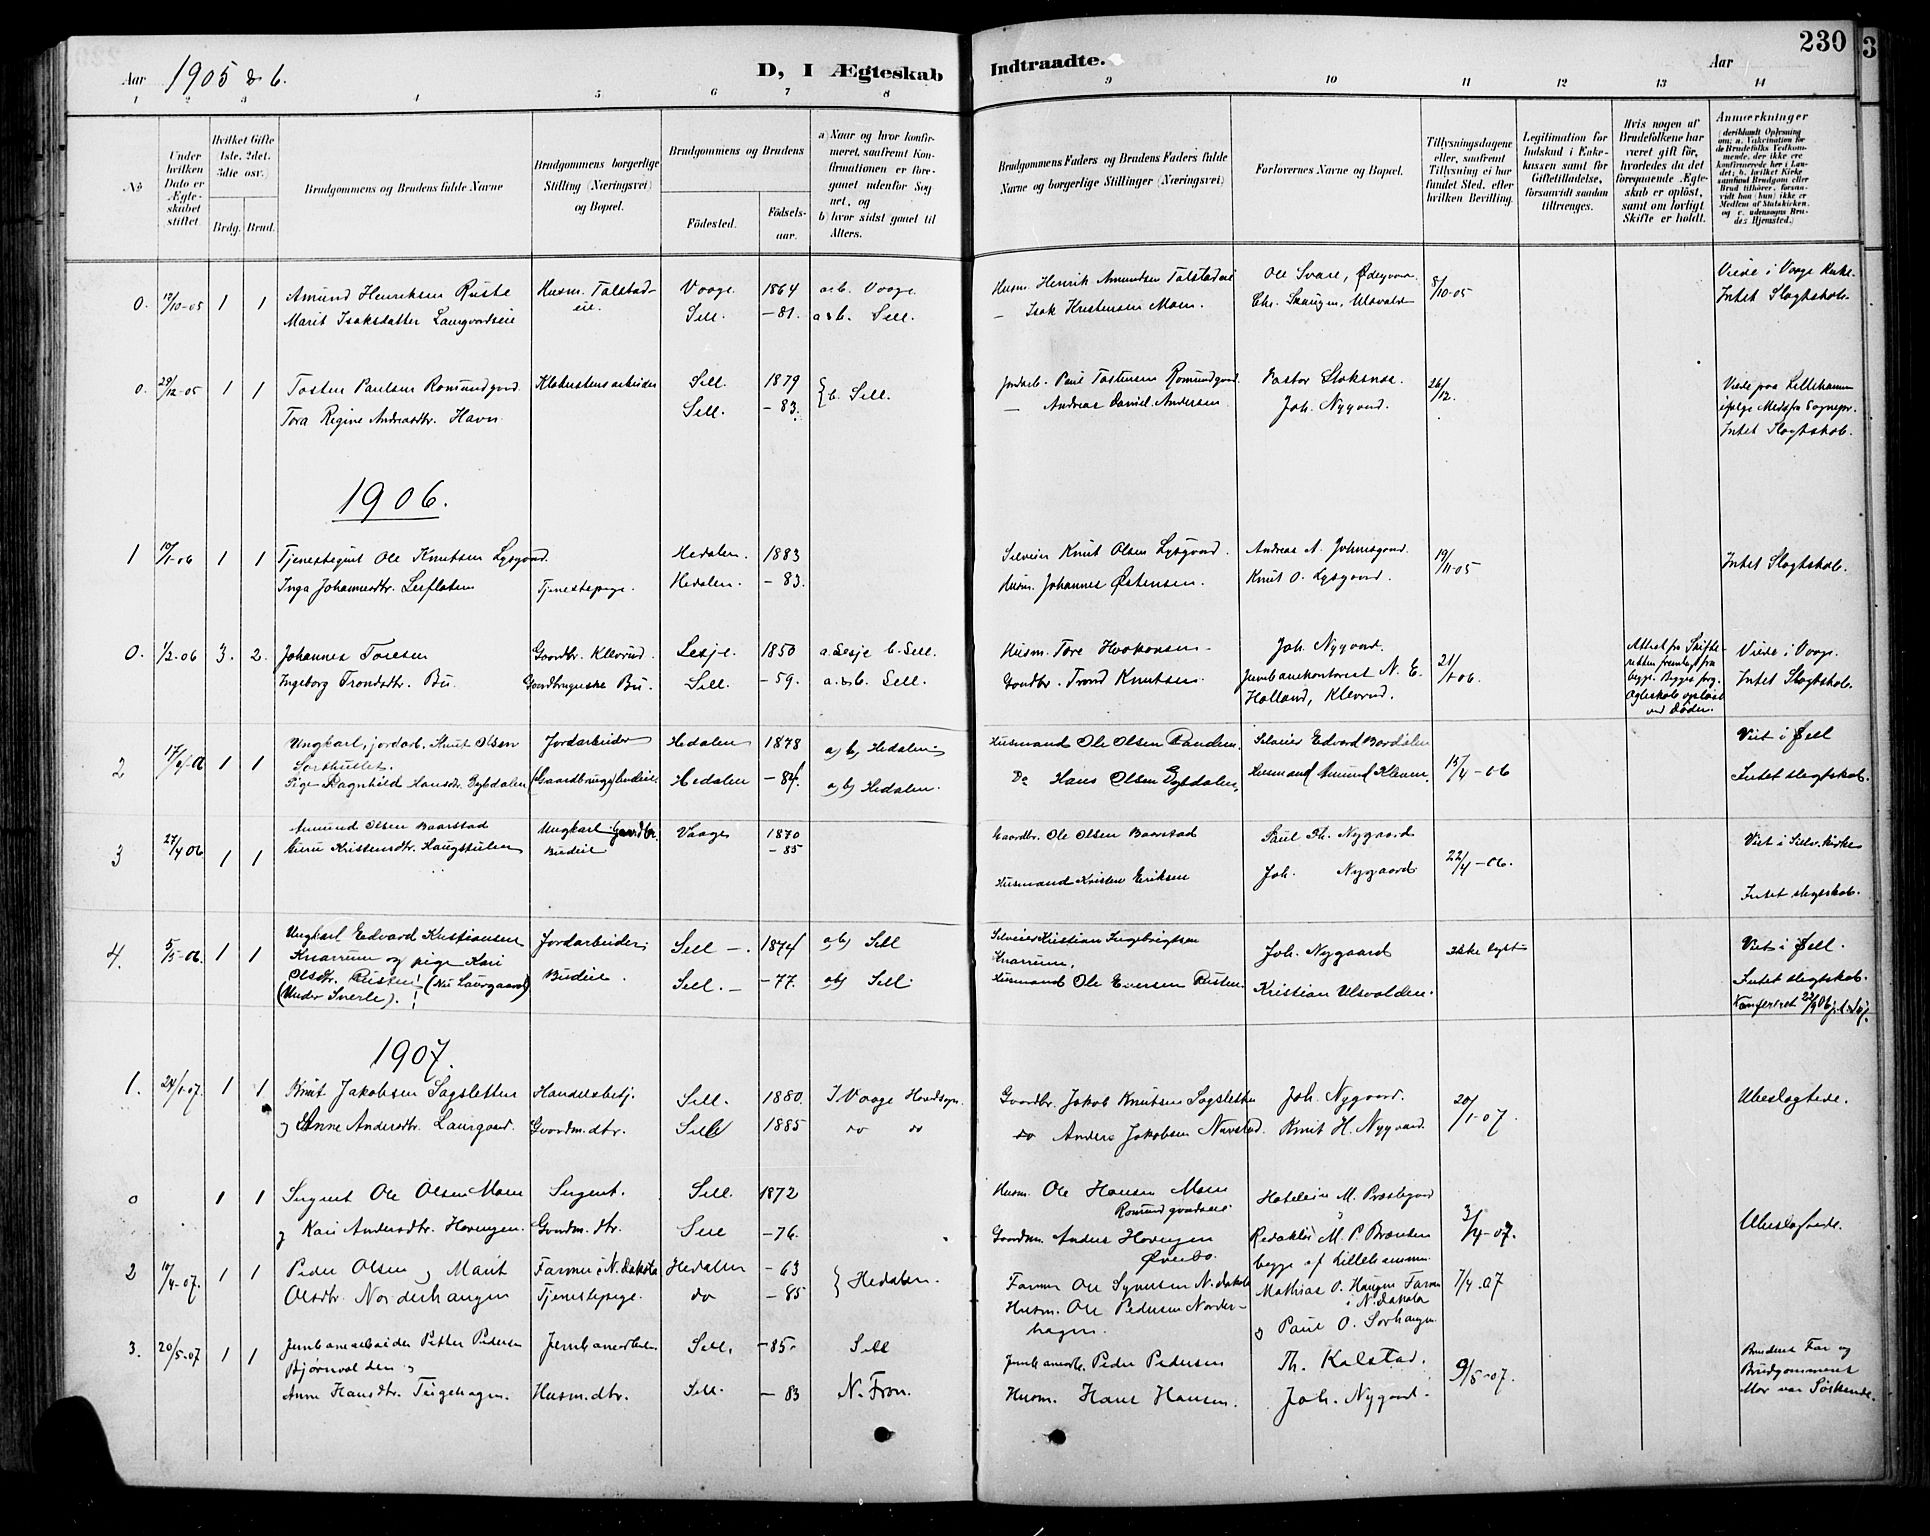 SAH, Sel prestekontor, Klokkerbok nr. 1, 1894-1923, s. 230